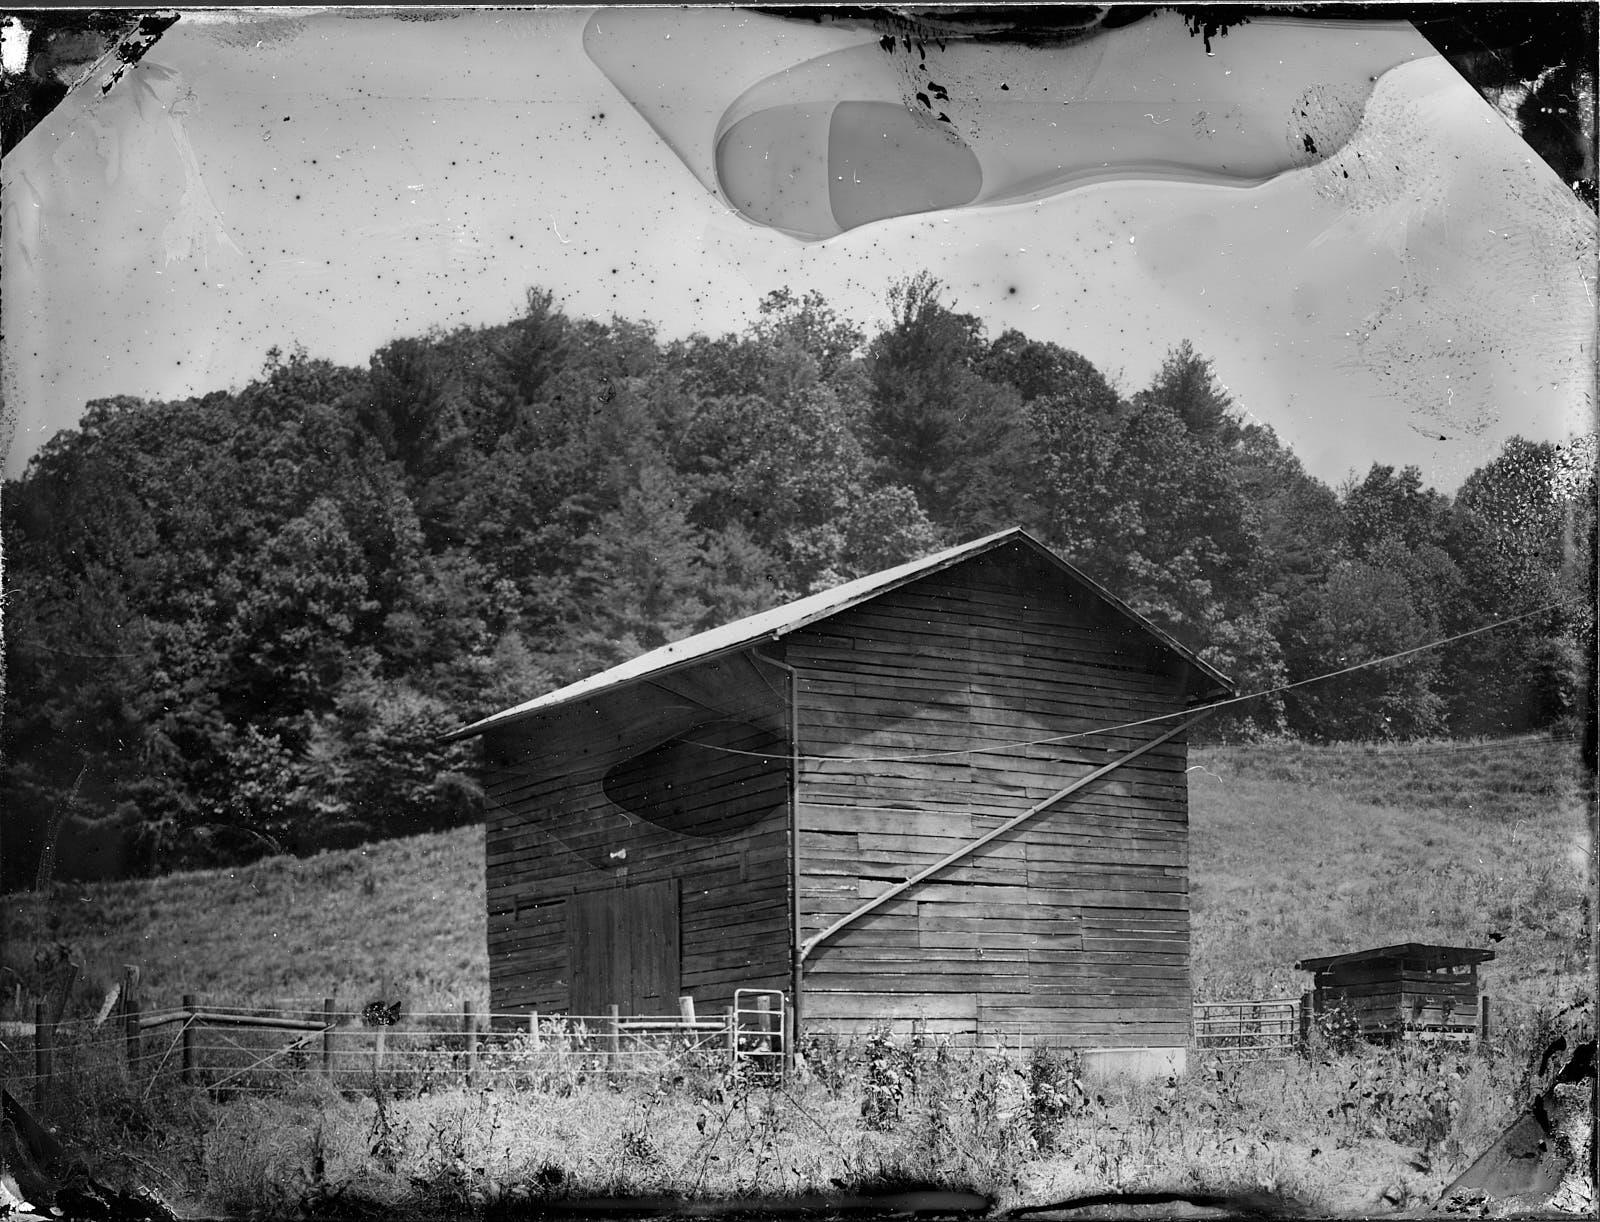 Old Barn - Marshall, North Carolina, USA - June 2018